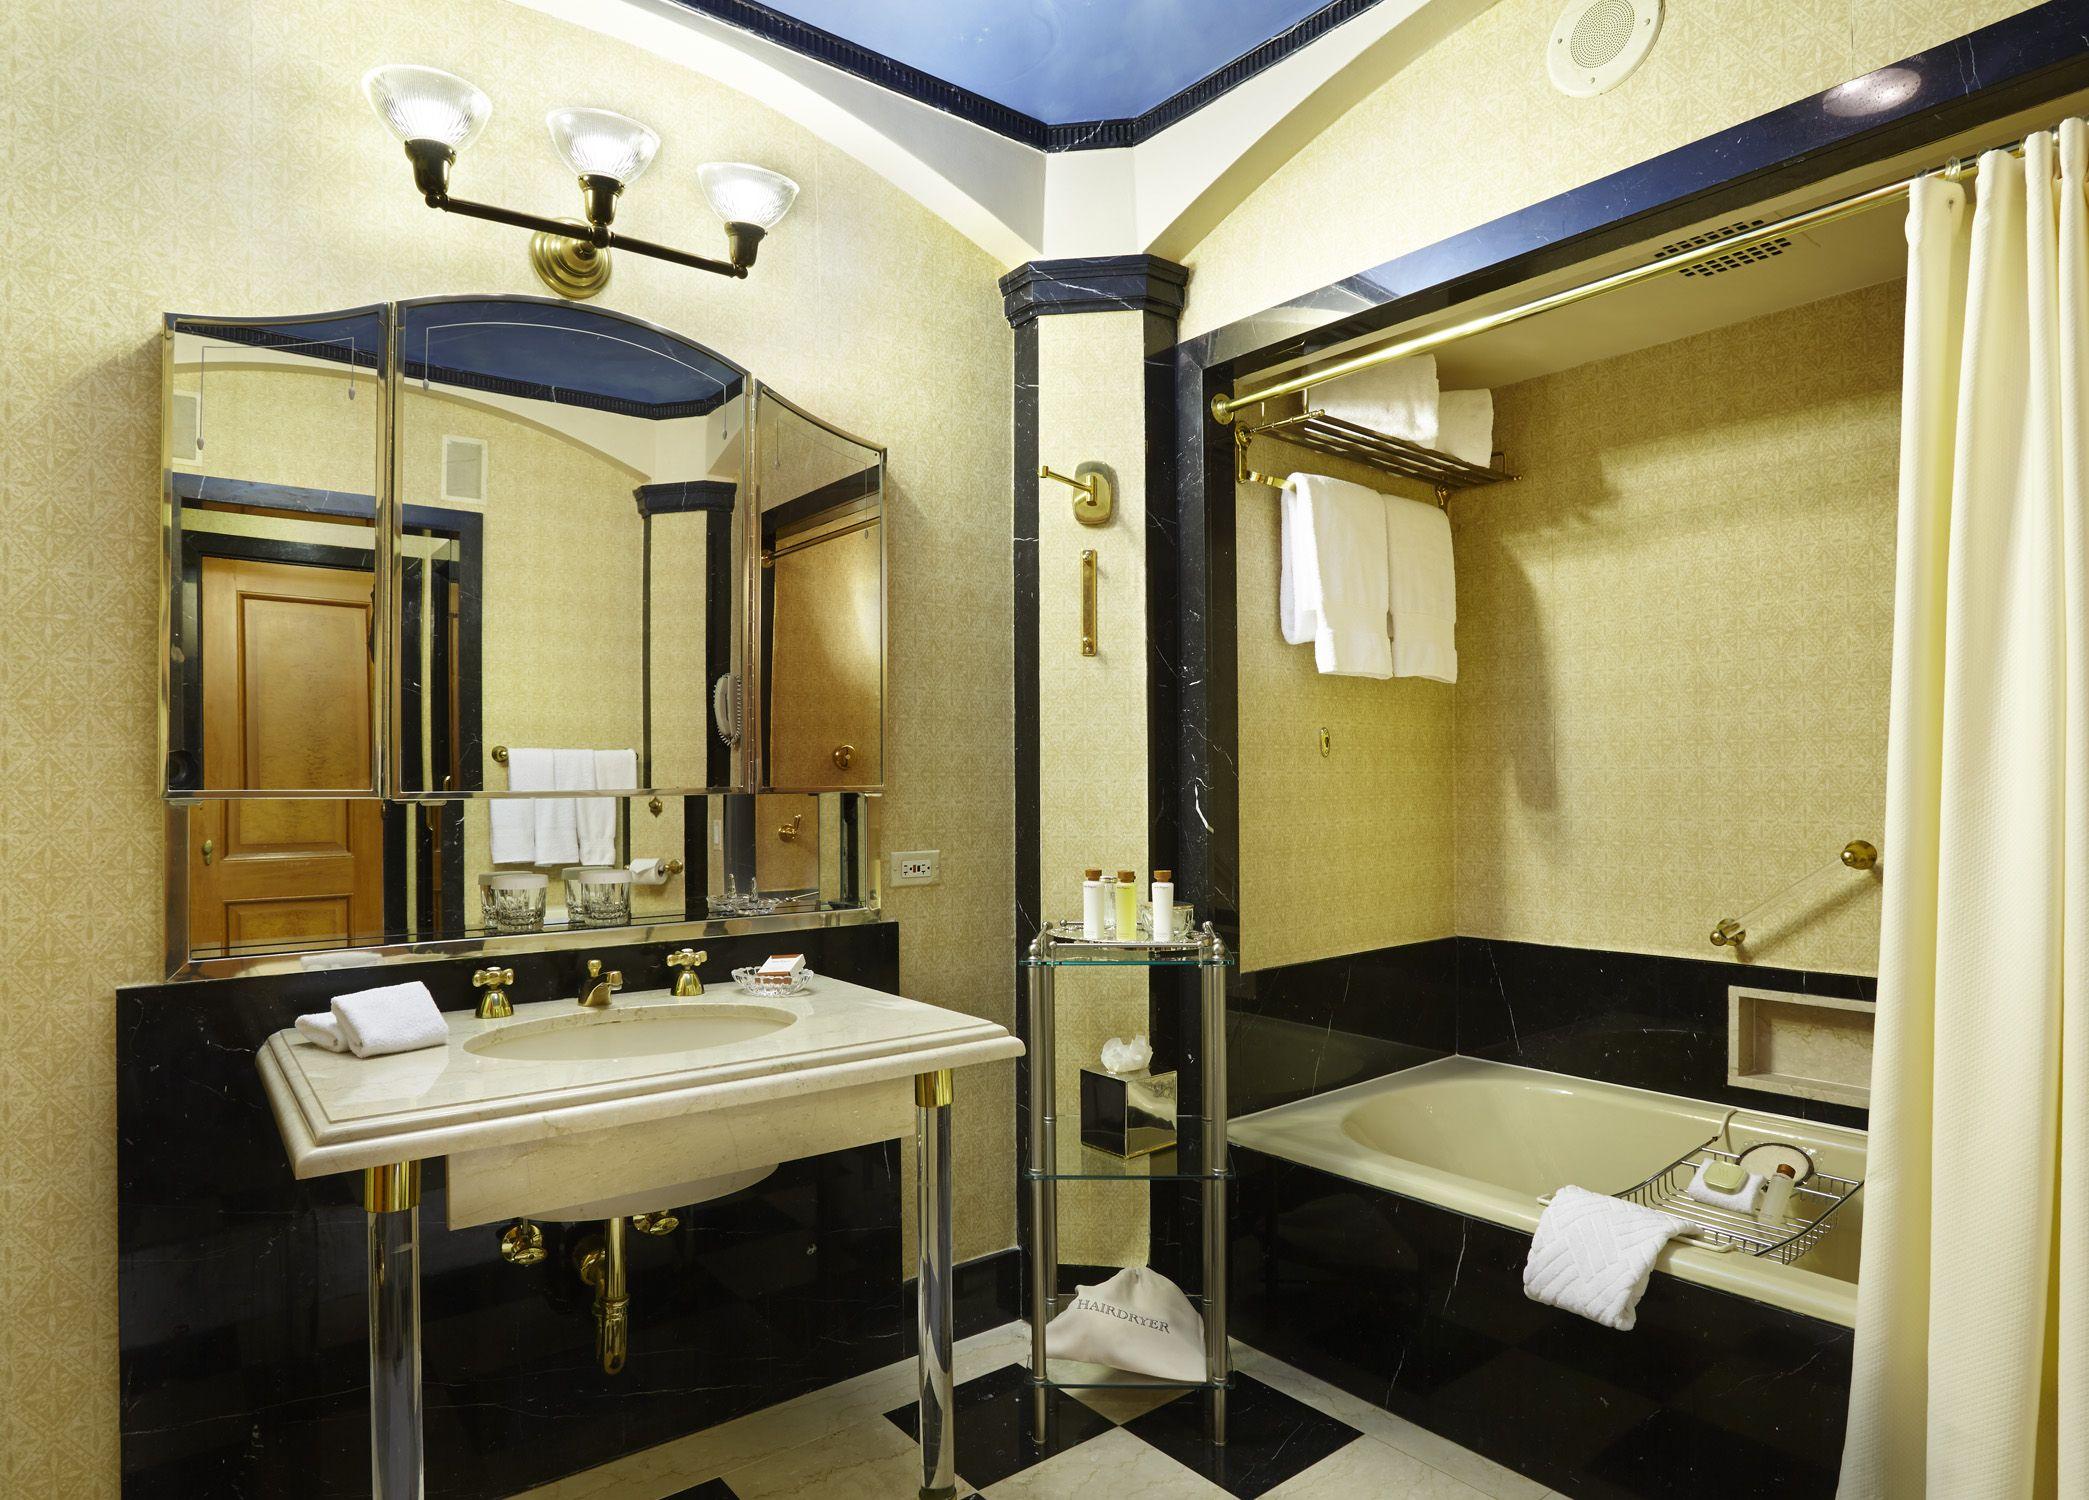 new bathroom images%0A Bathroom inspiration